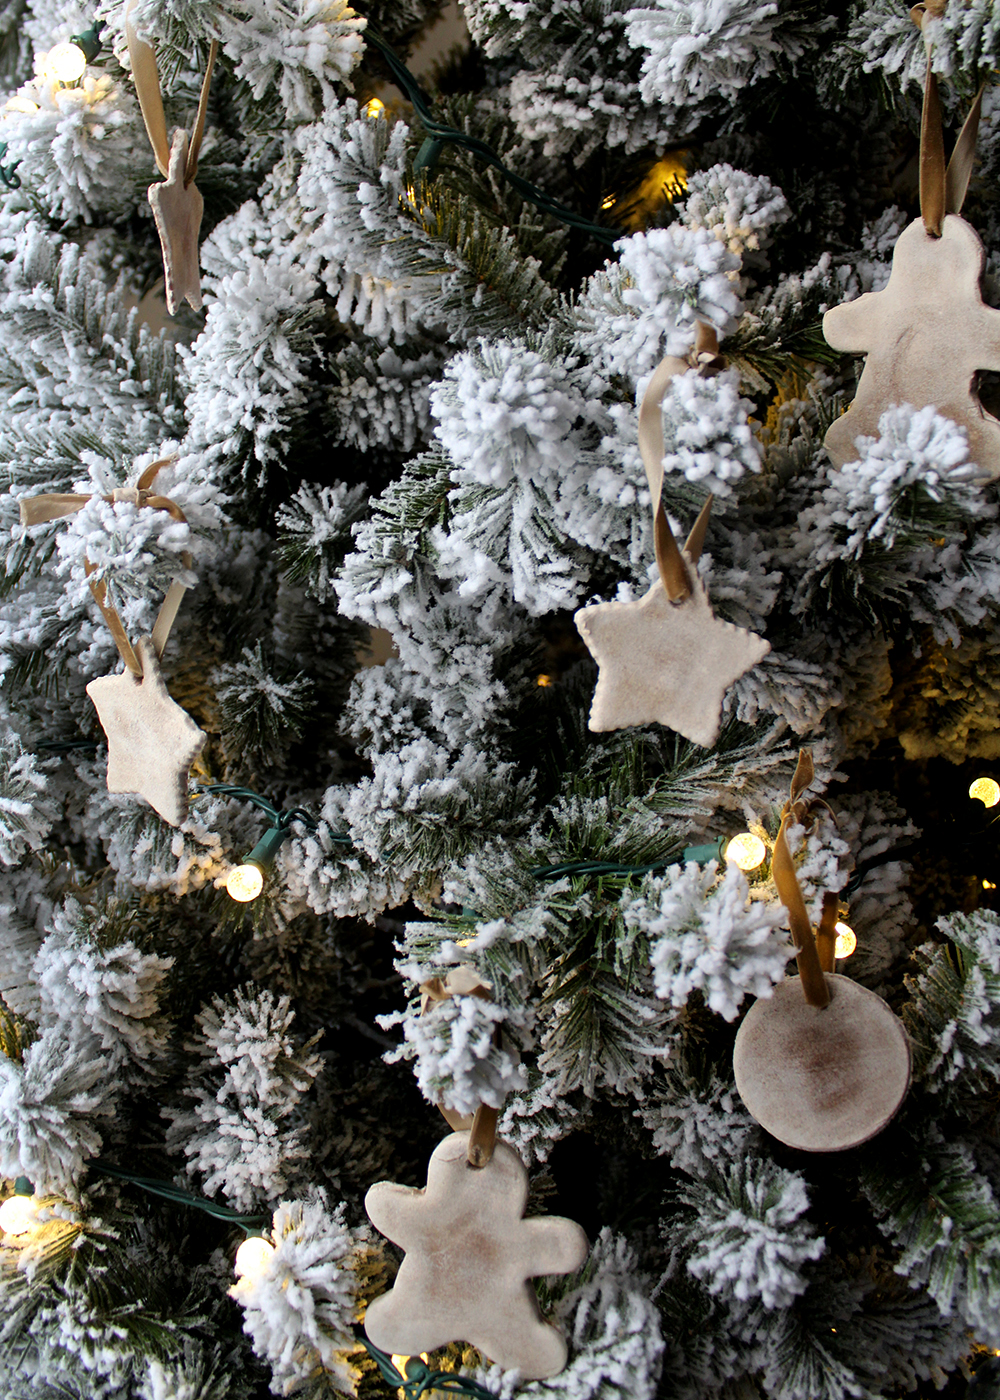 Homemade Salt Dough Ornaments With Cinnamon & Maple Ginger Insructions #handmadeChristmas #homemadeornament #budgetcraft